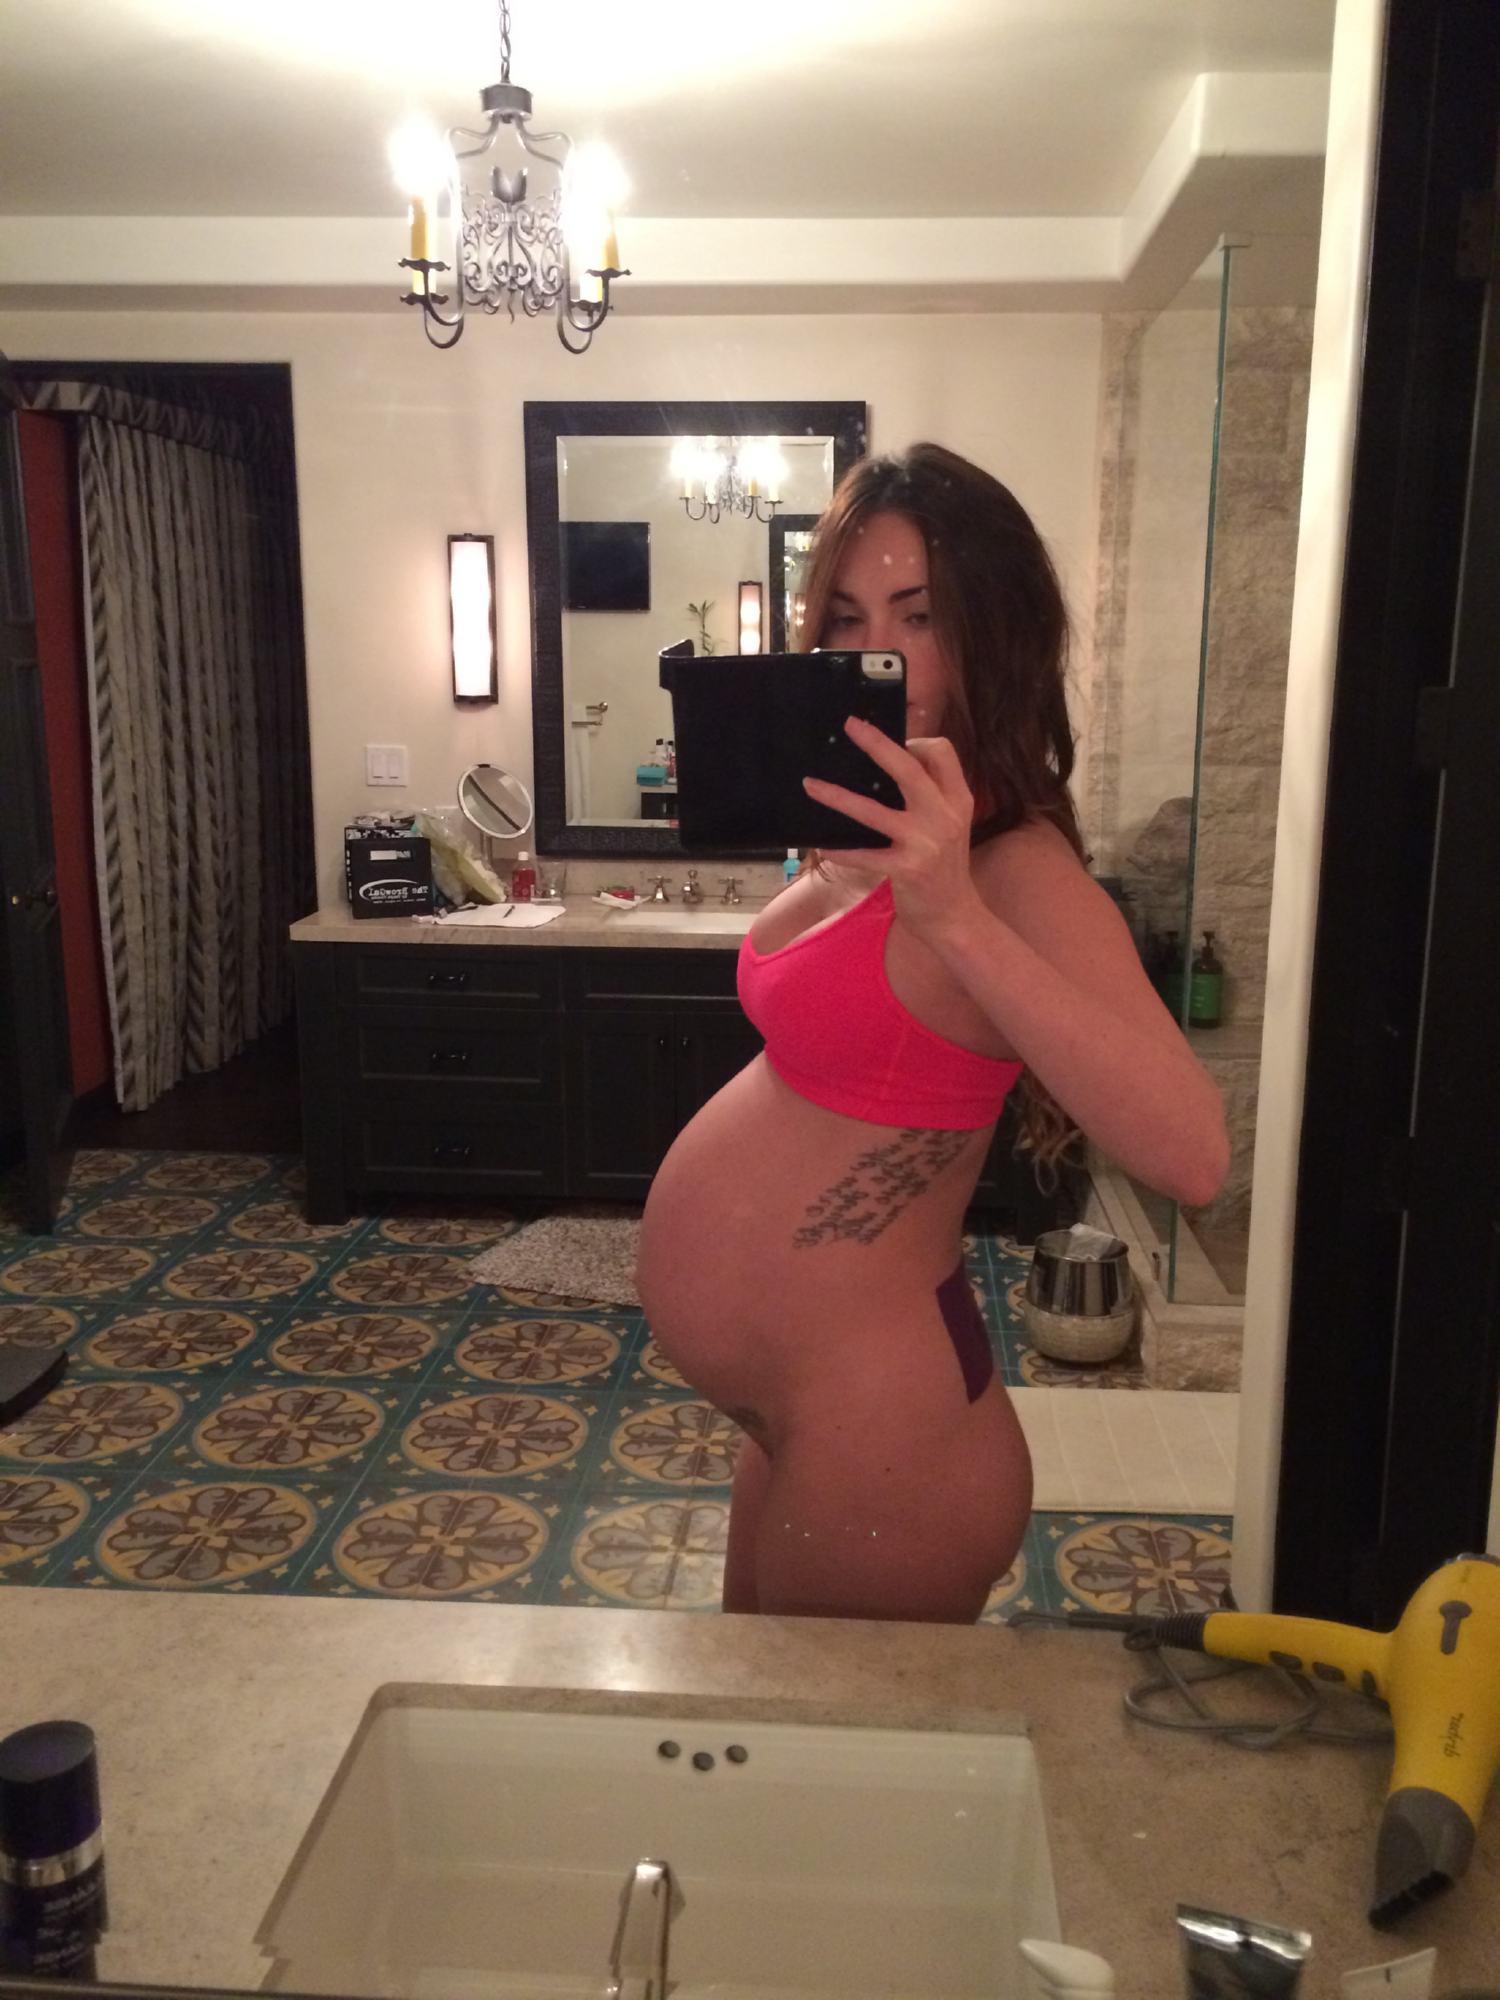 When nude selfies get hacked, is celeb to blame?